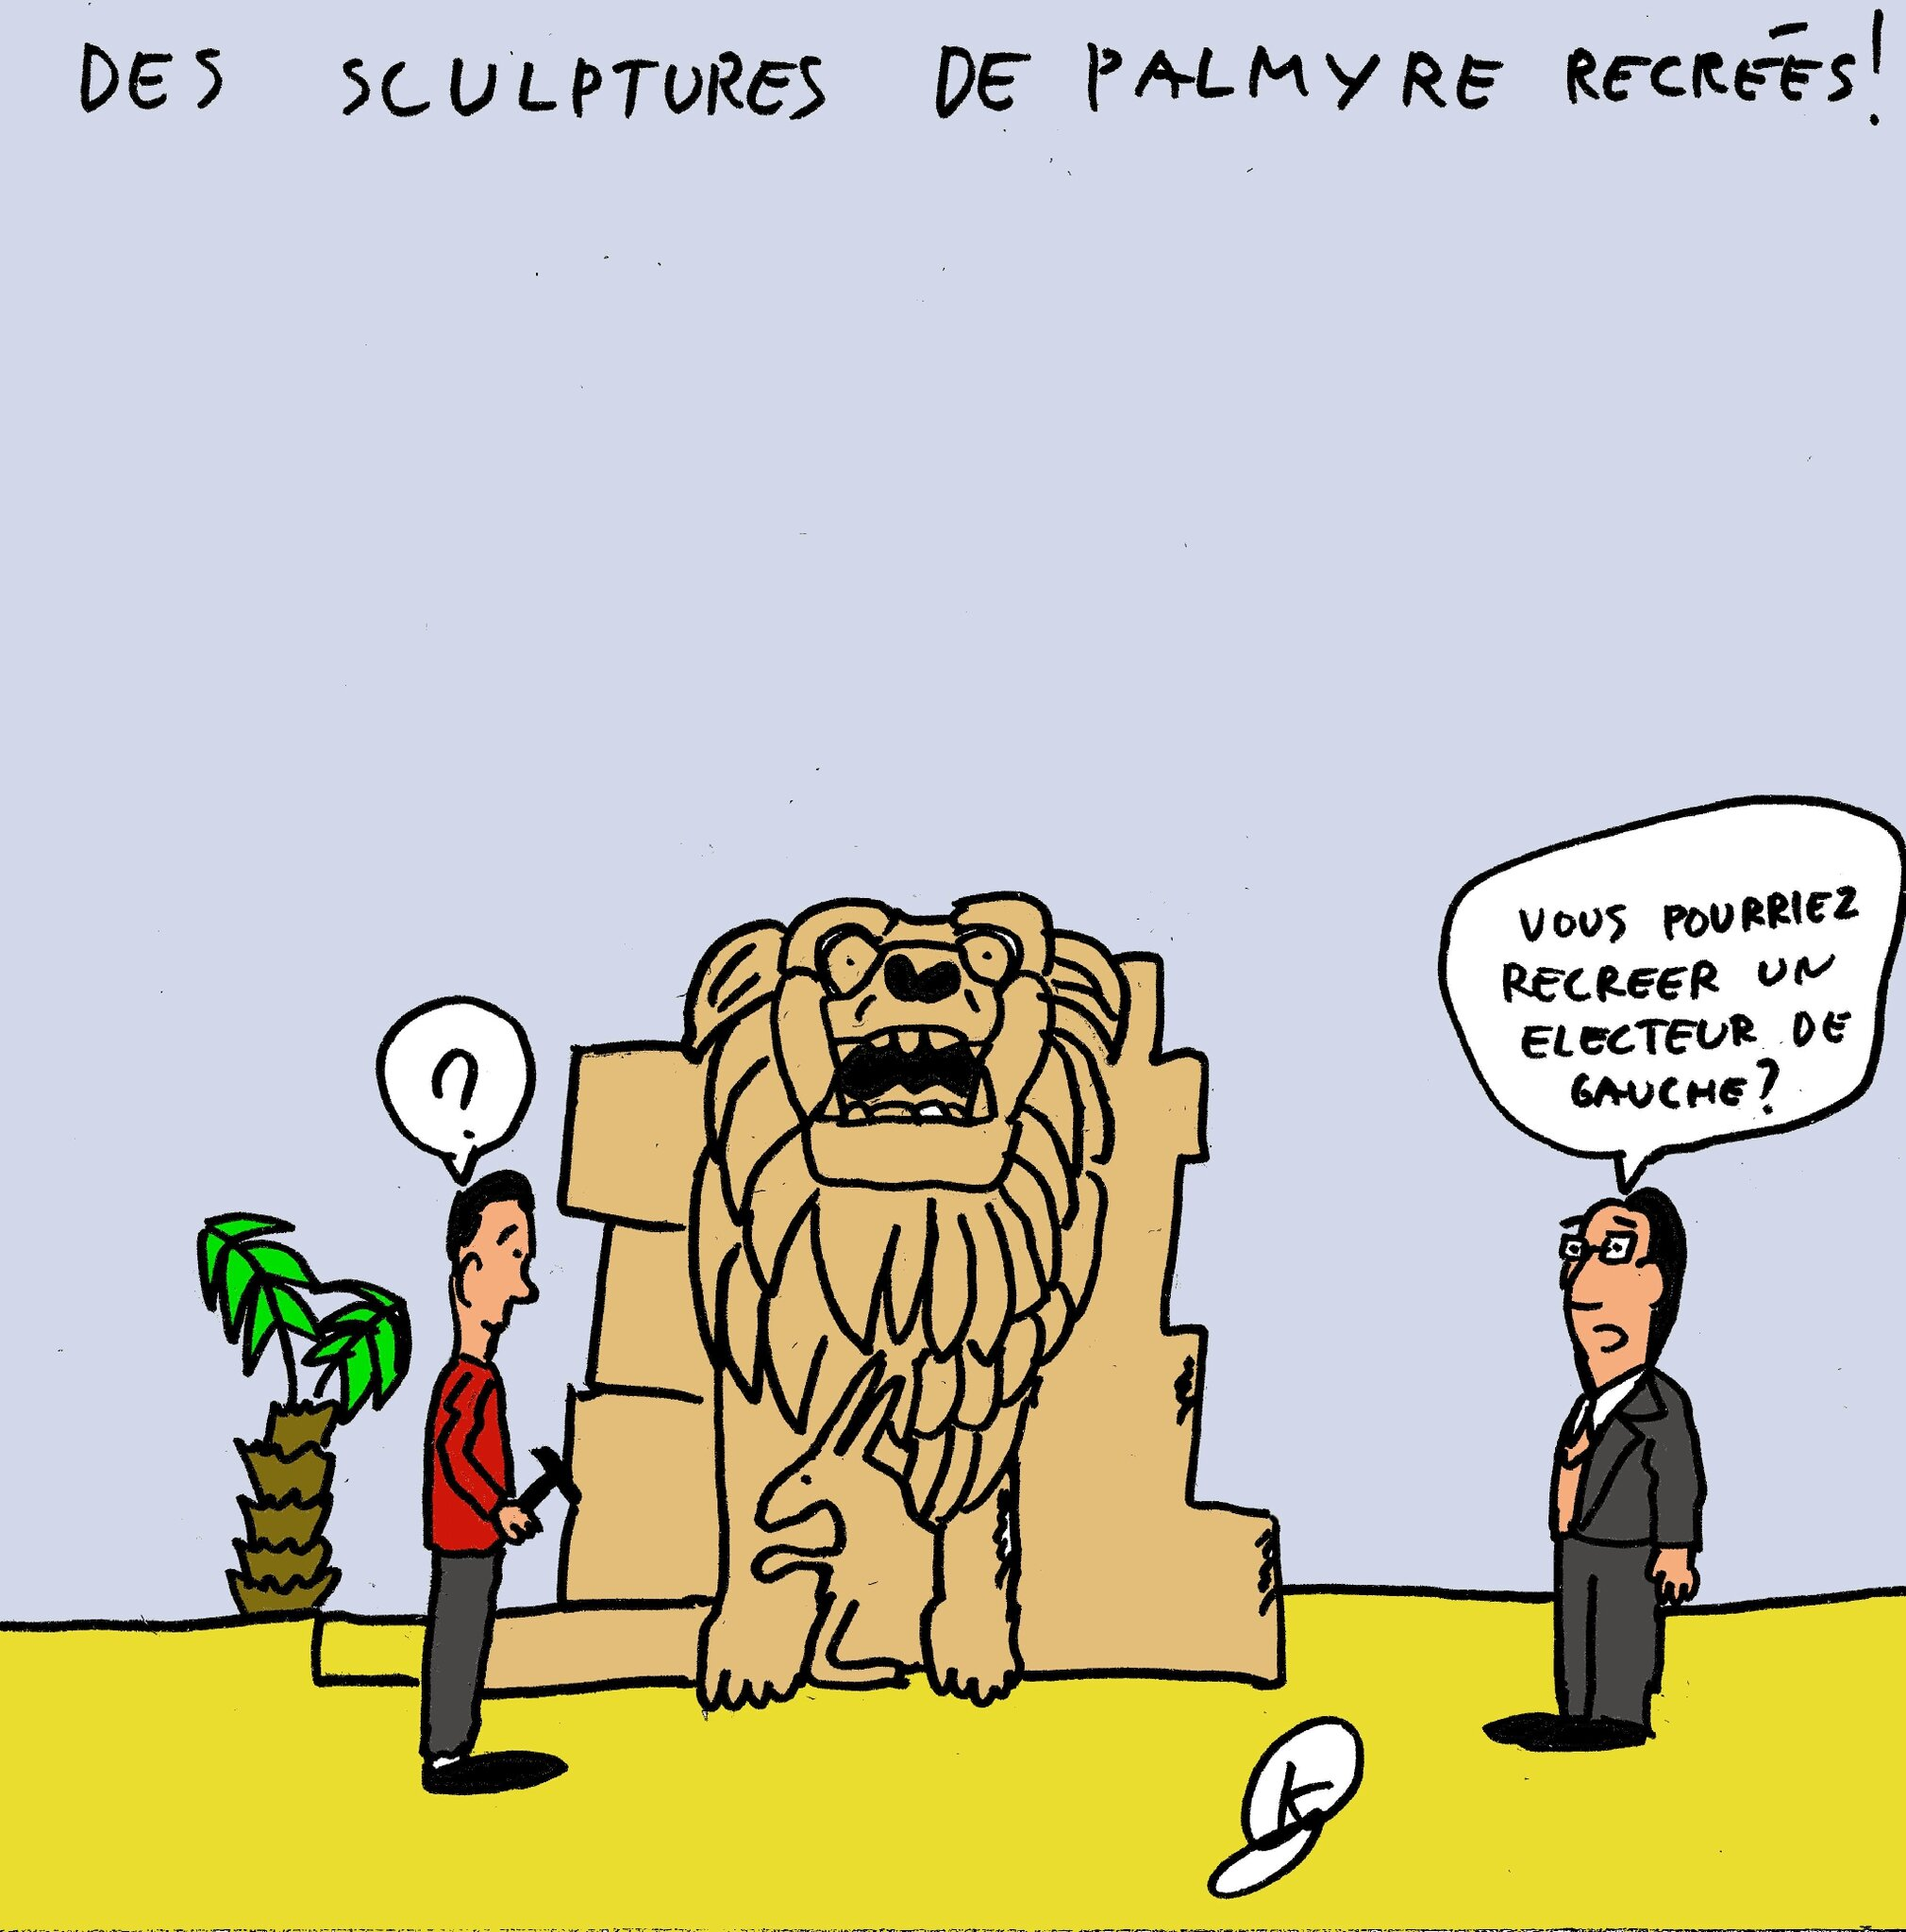 palmyre-statues